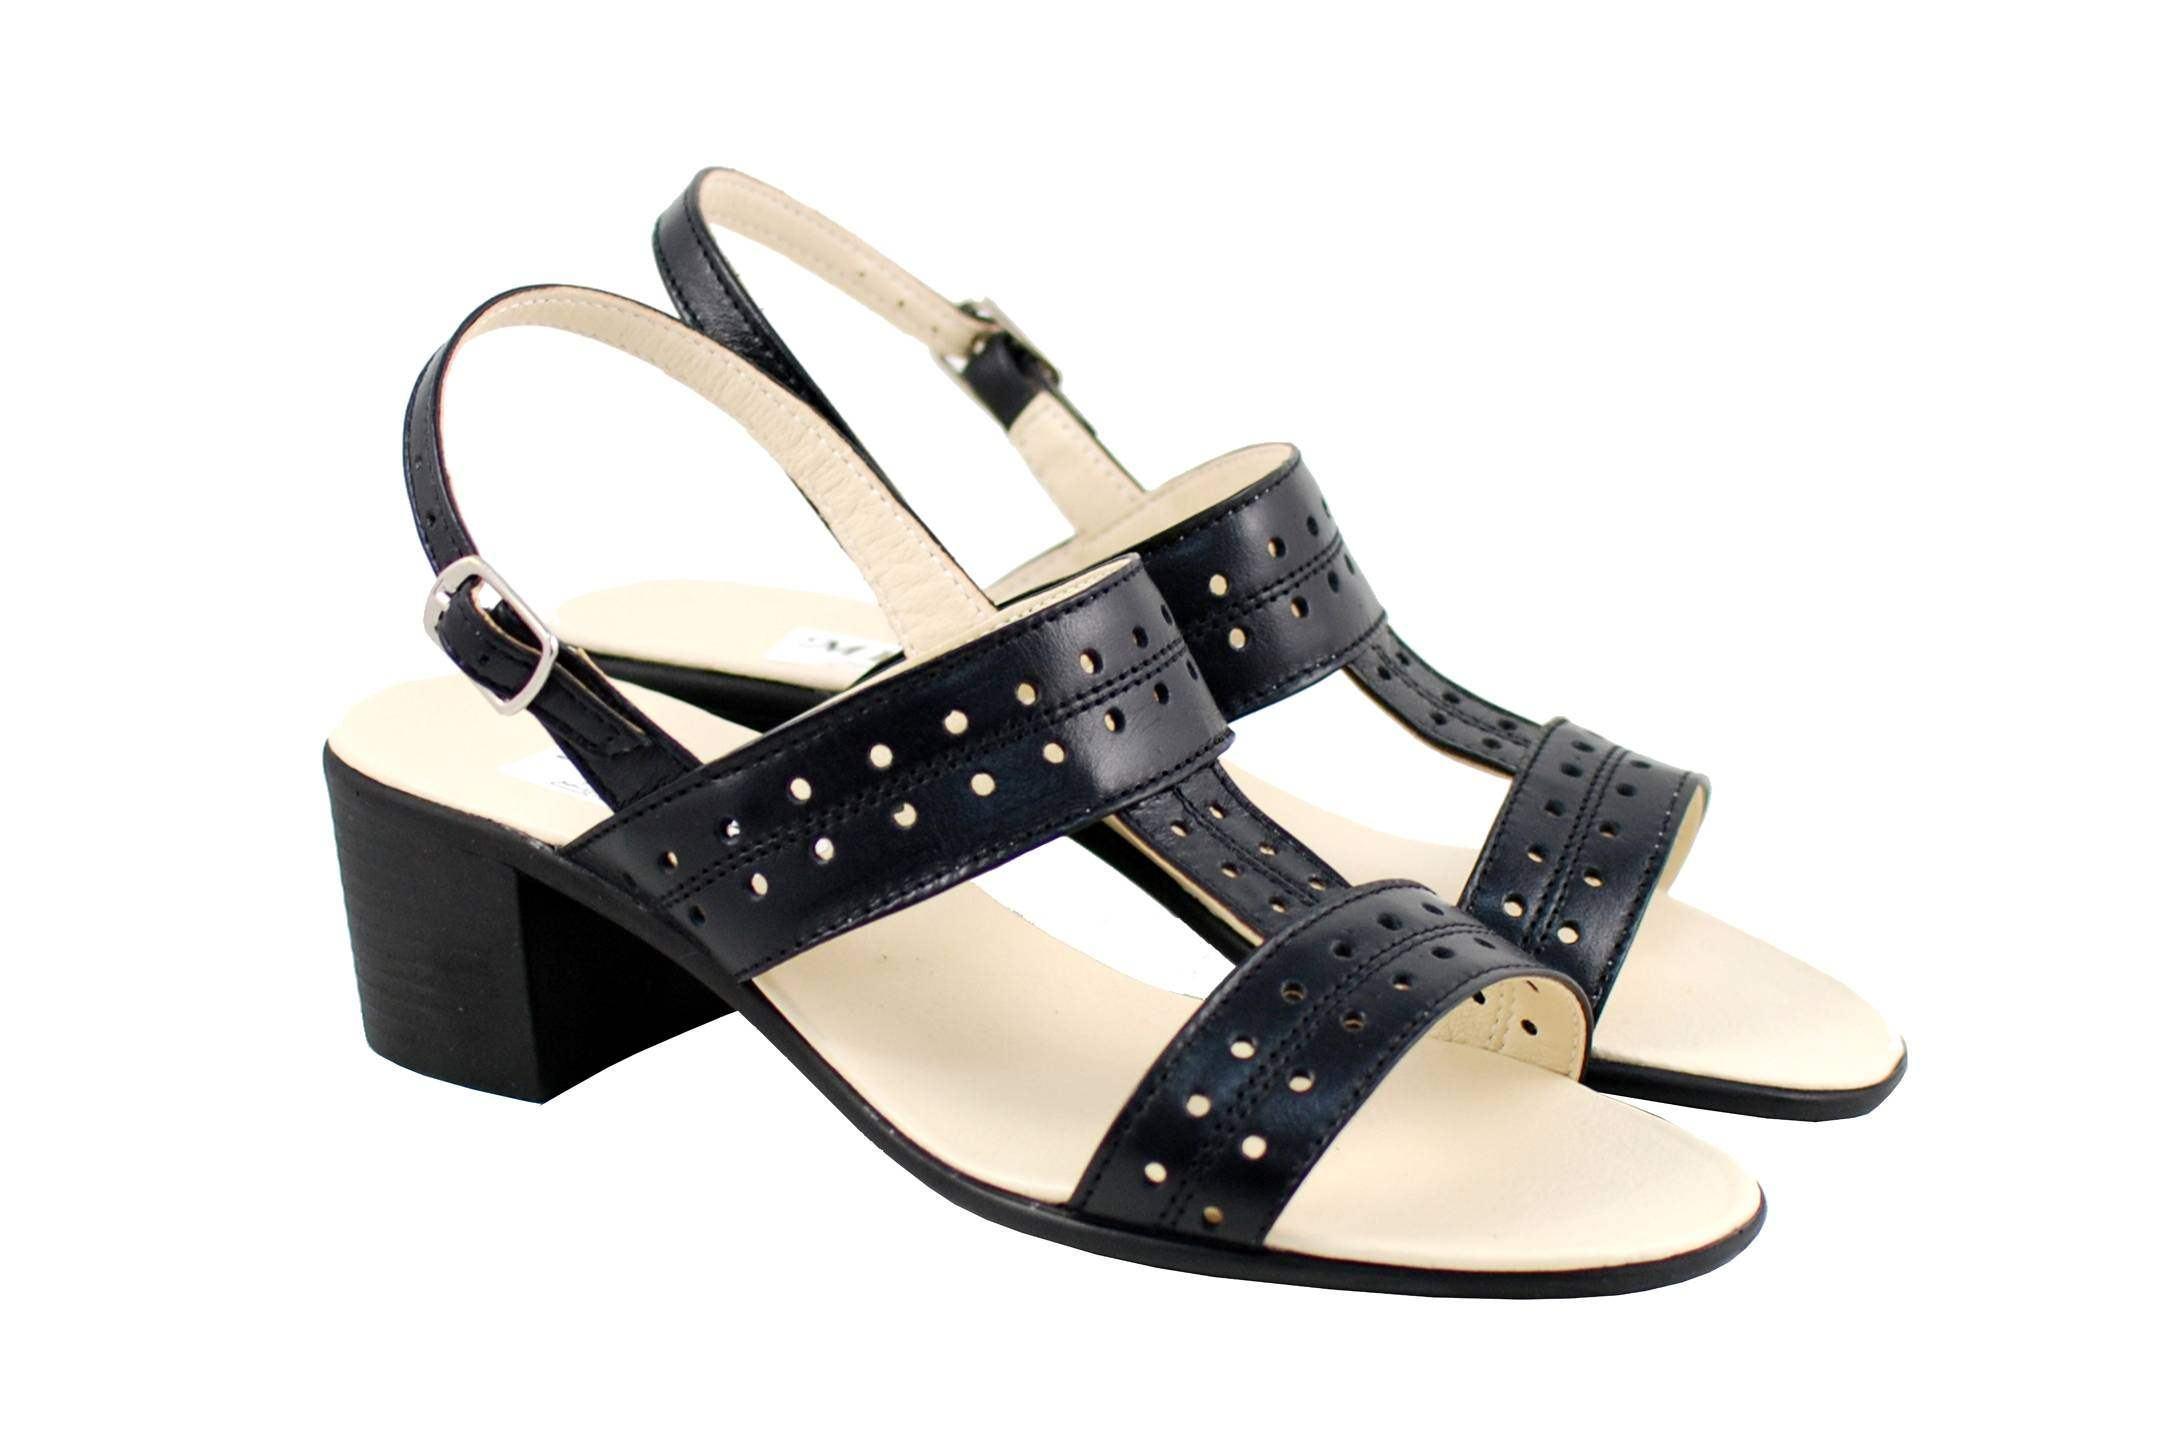 Lichidare marimea 36 Sandale dama din piele naturala, negru box - LS7NBOX